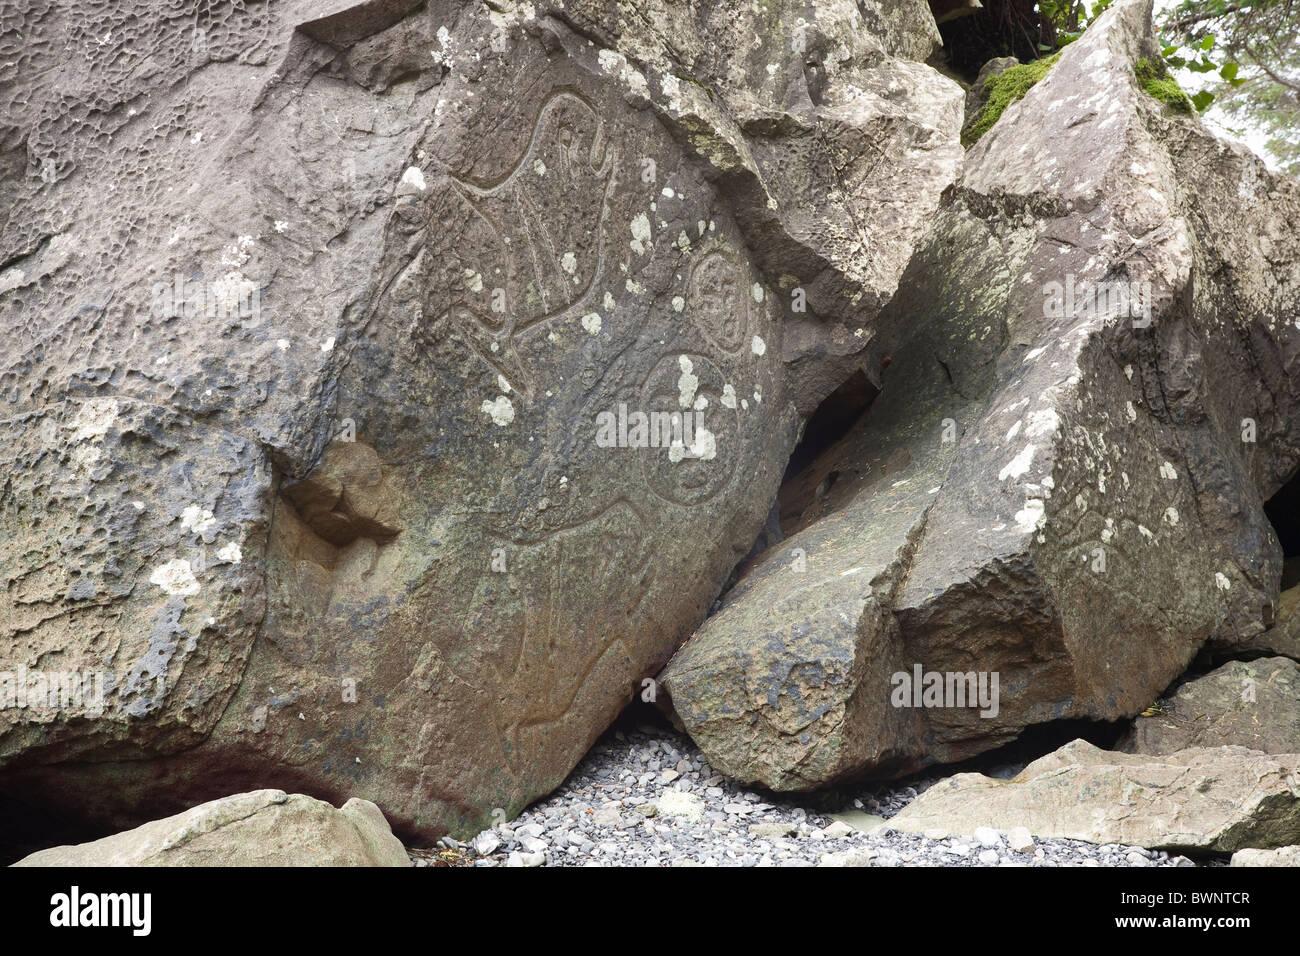 makah petroglyphs near wedding rocks ozette loop olympic national